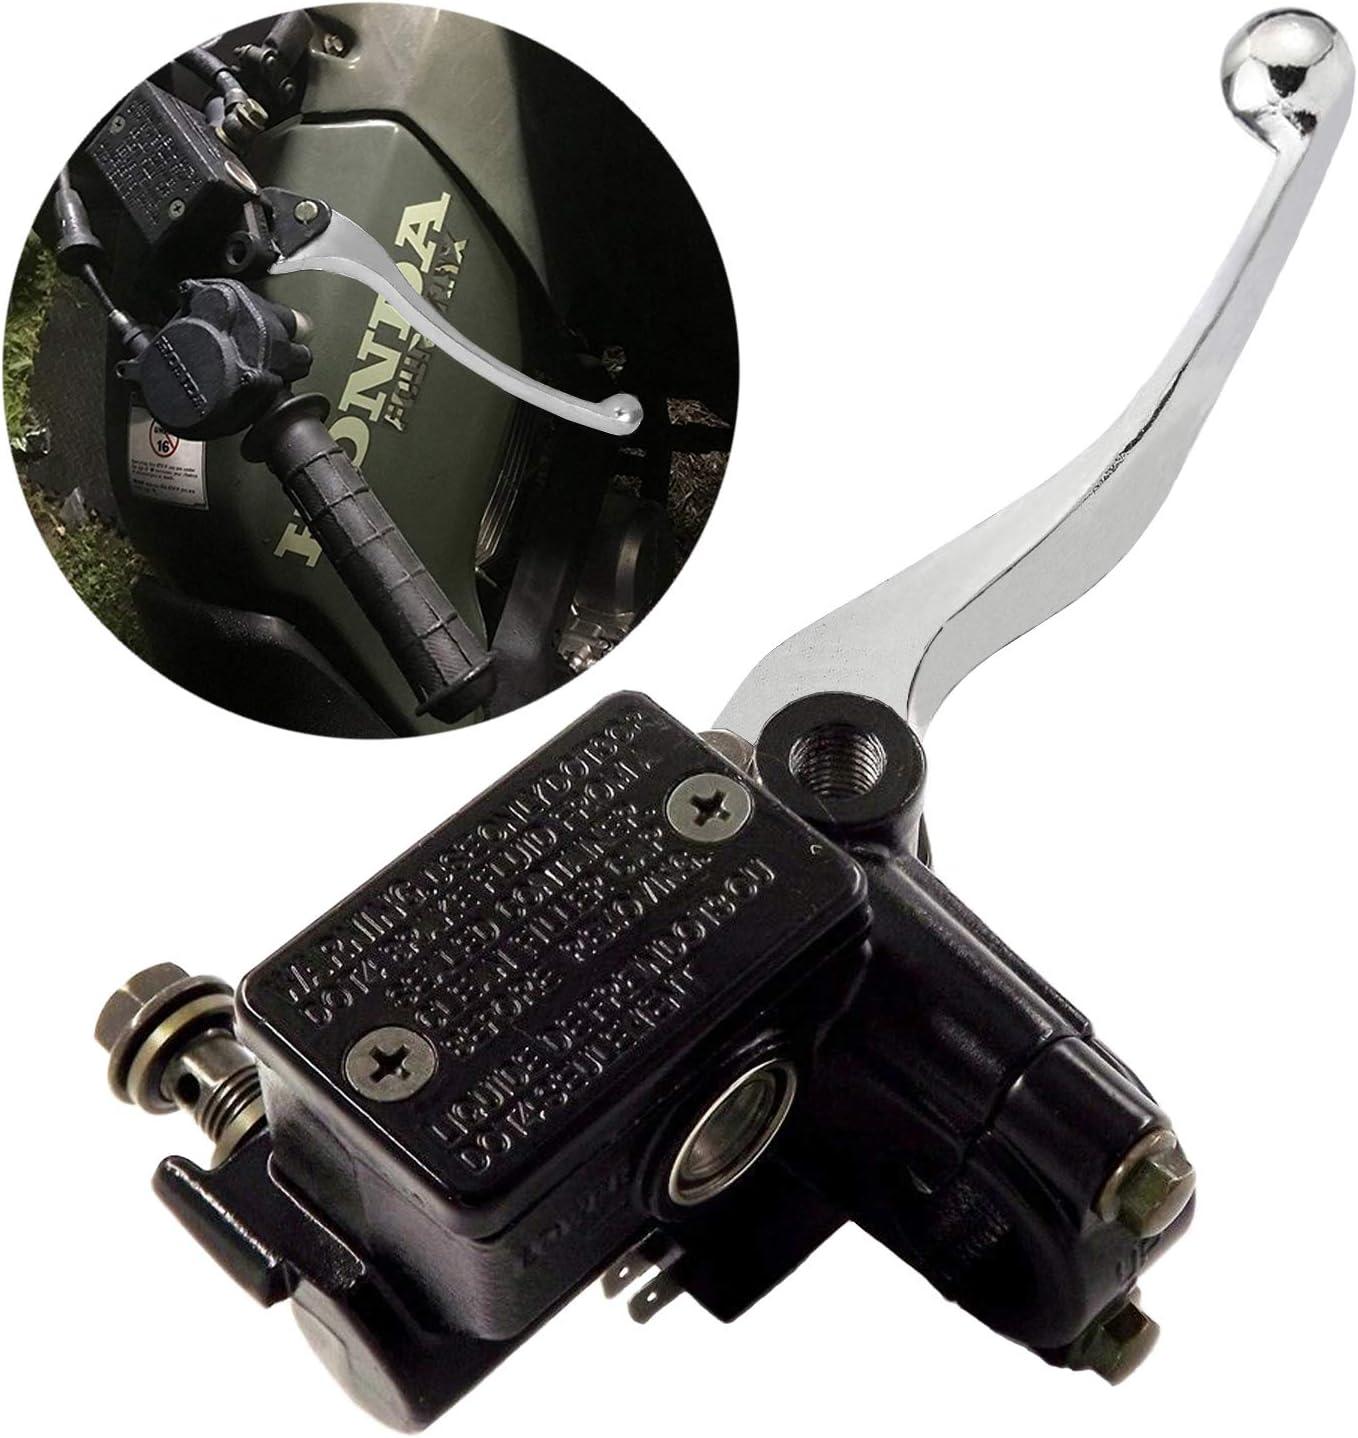 Brake Master Cylinder for Yamaha YFZ450 Banshee 350 Big Bear 250 350 400 Grizzly 300 350 400 450 550 600 660 700 Kodiak Raptor 125 250 350 660R 700 700R TRX 250 300 350 450 Rincon Foreman